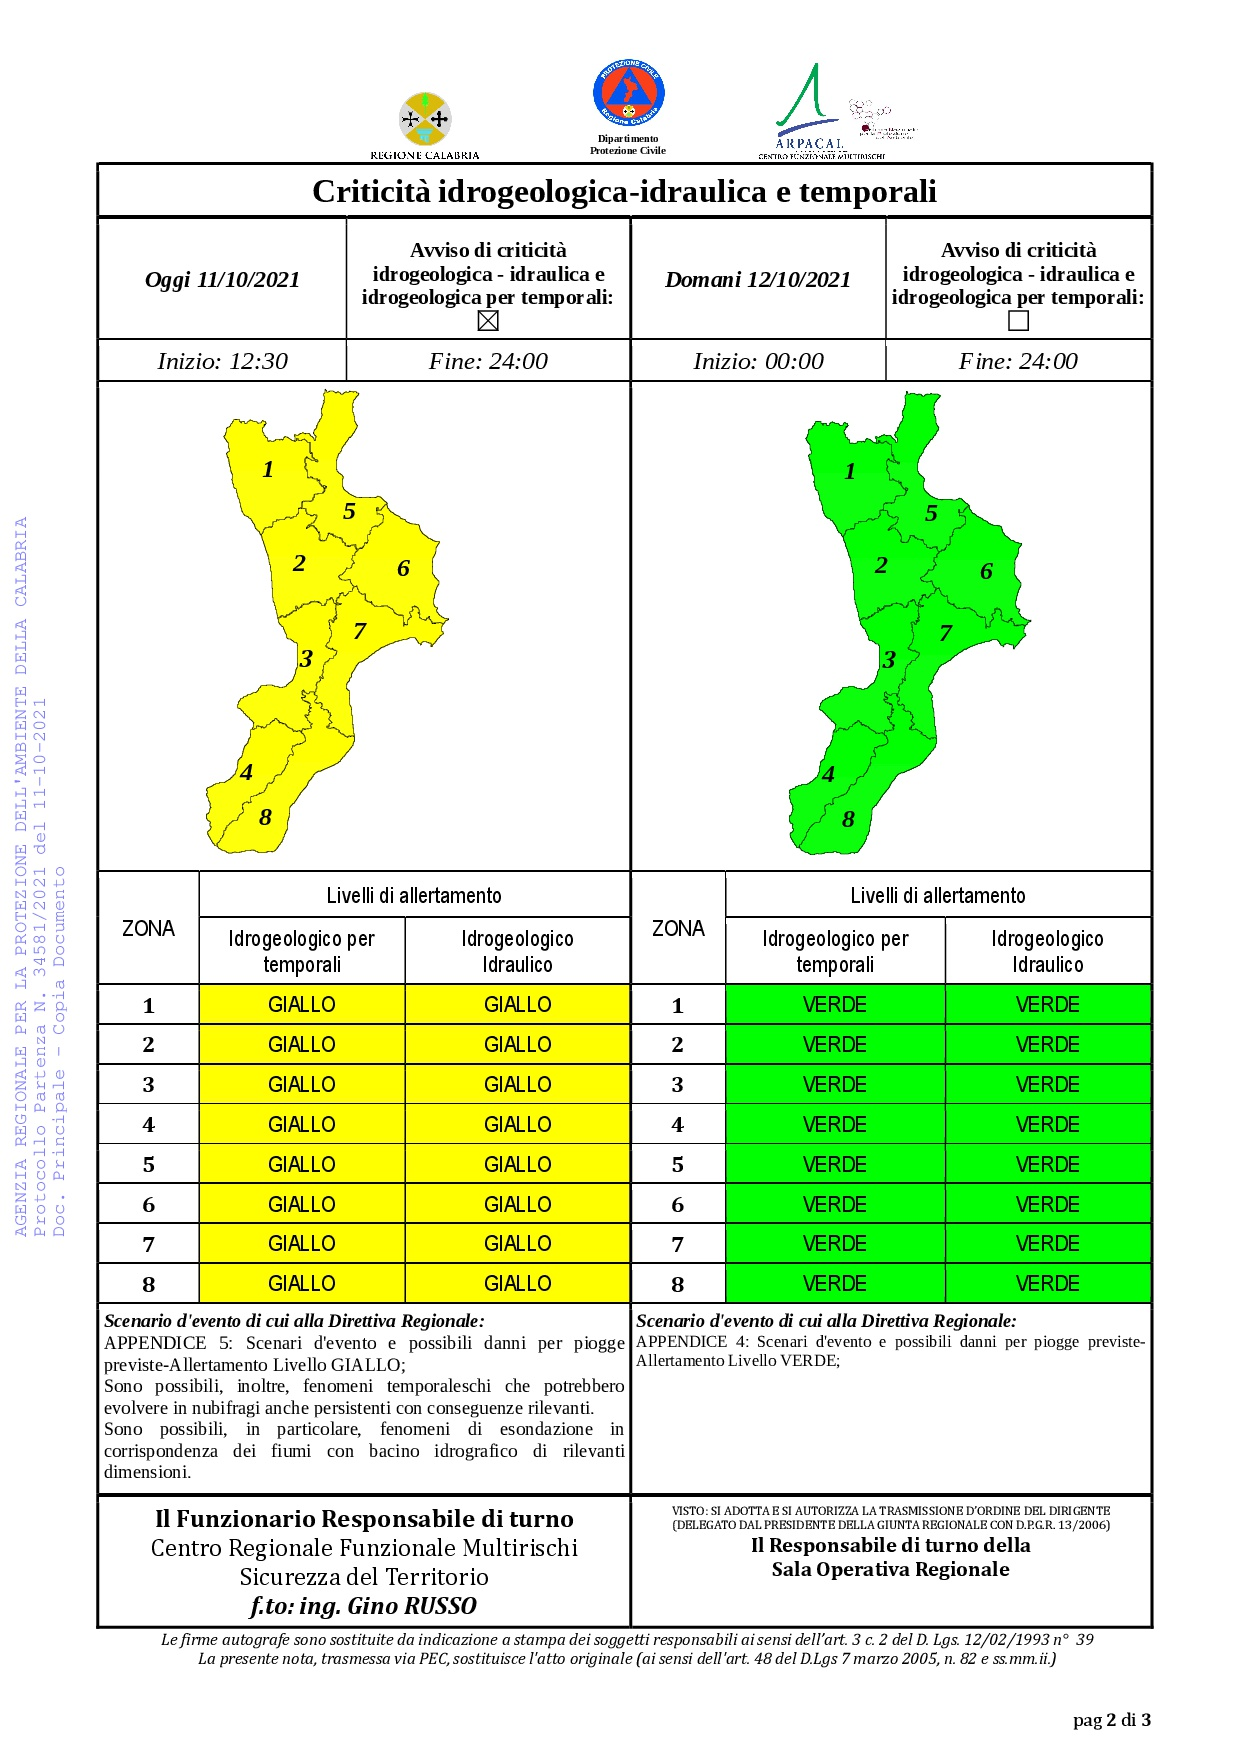 Criticità idrogeologica-idraulica e temporali in Calabria 11-10-2021